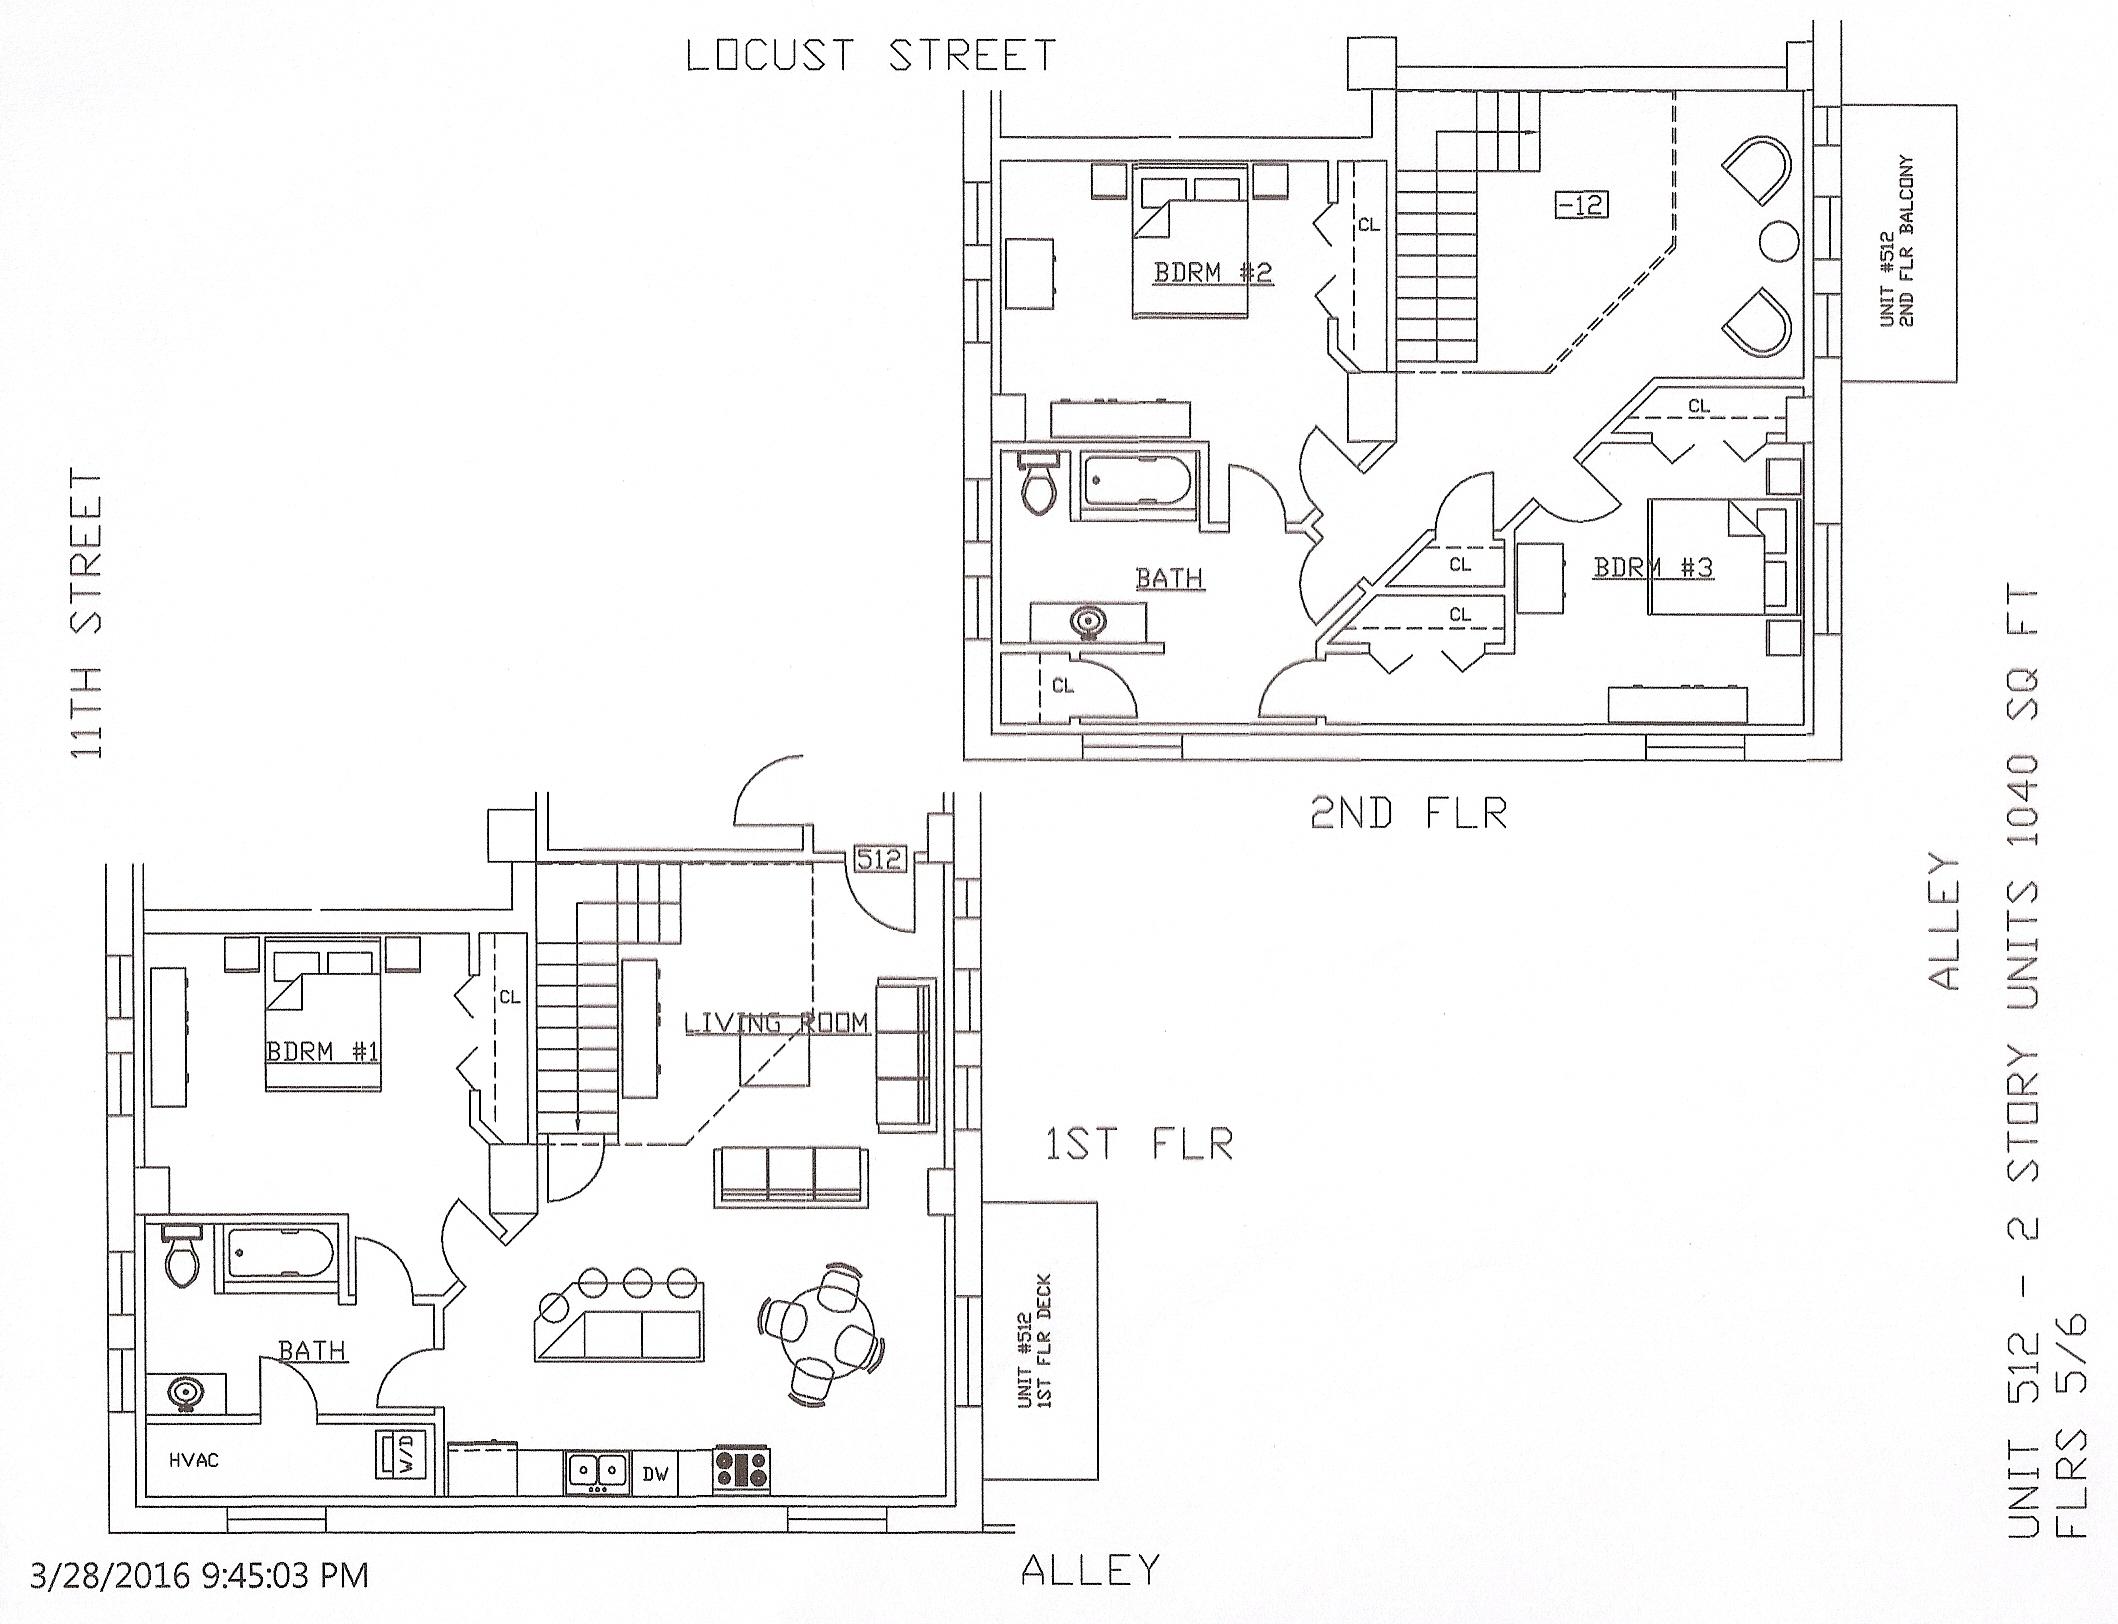 Unit 512, 1040 Square Feet